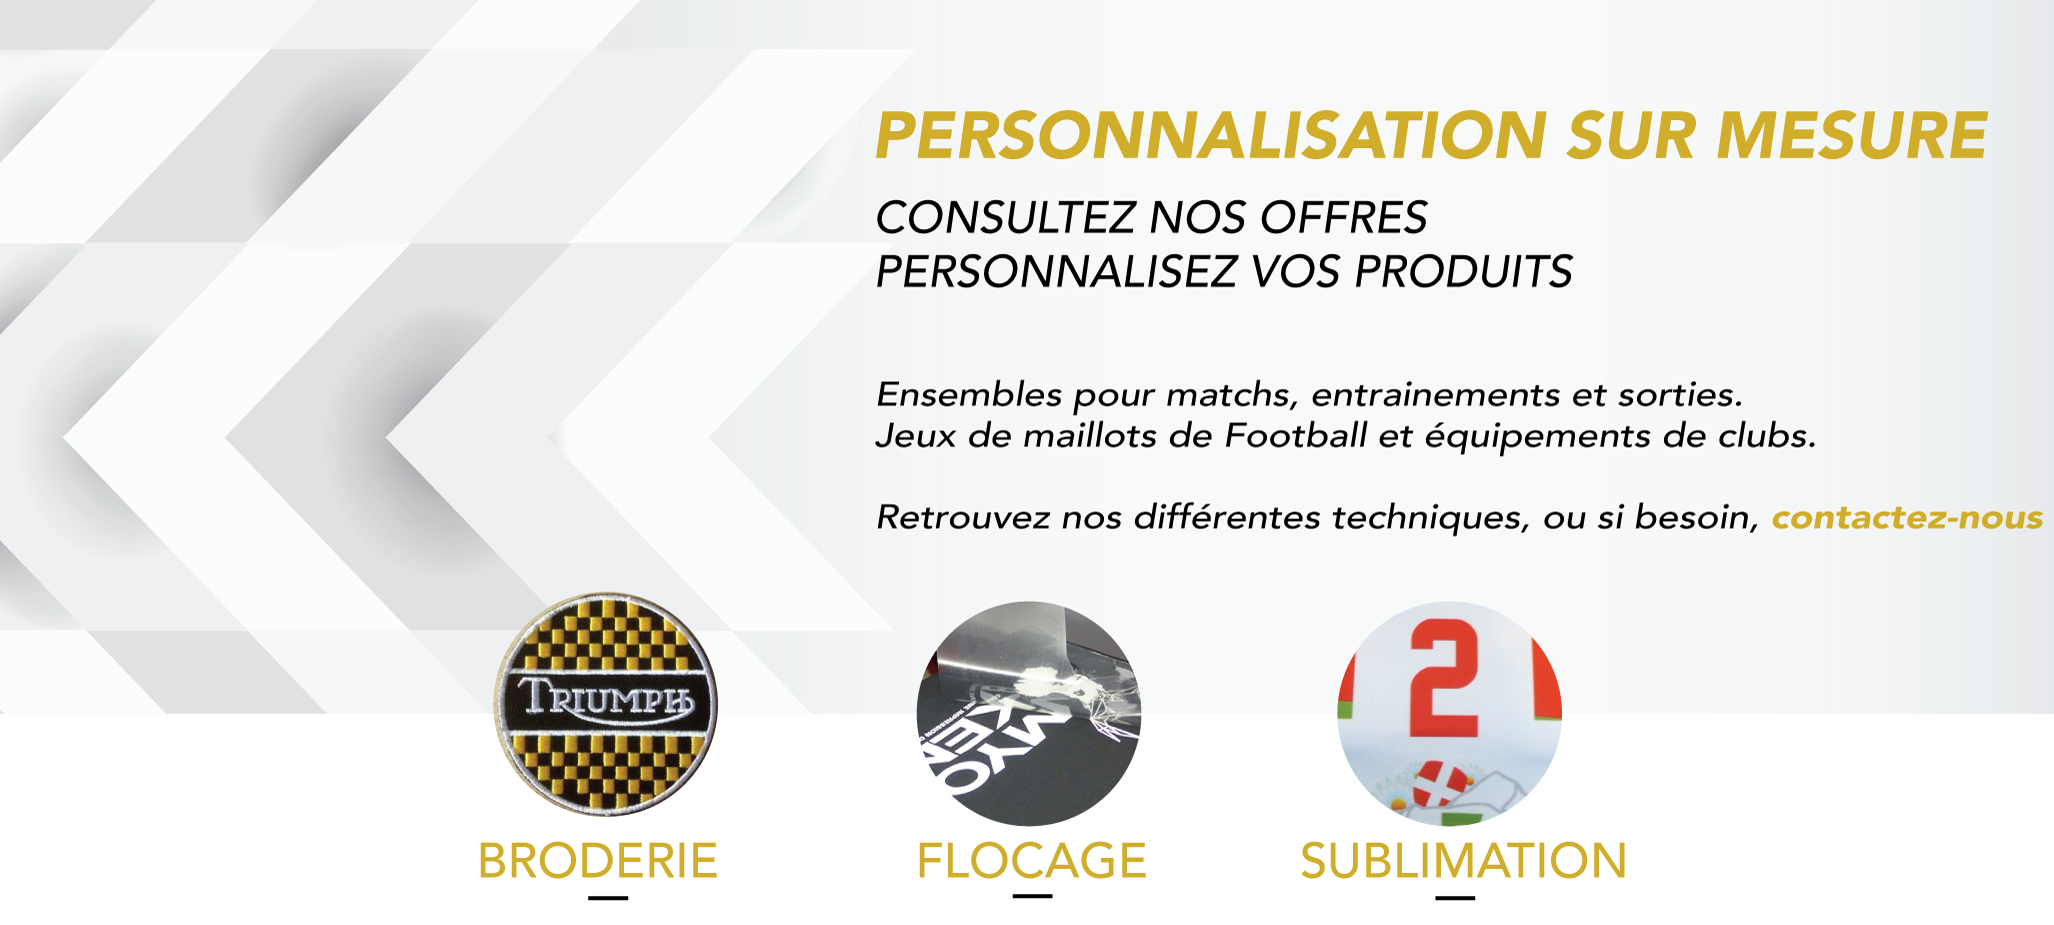 Flocage Personnalisation Futsal-Store